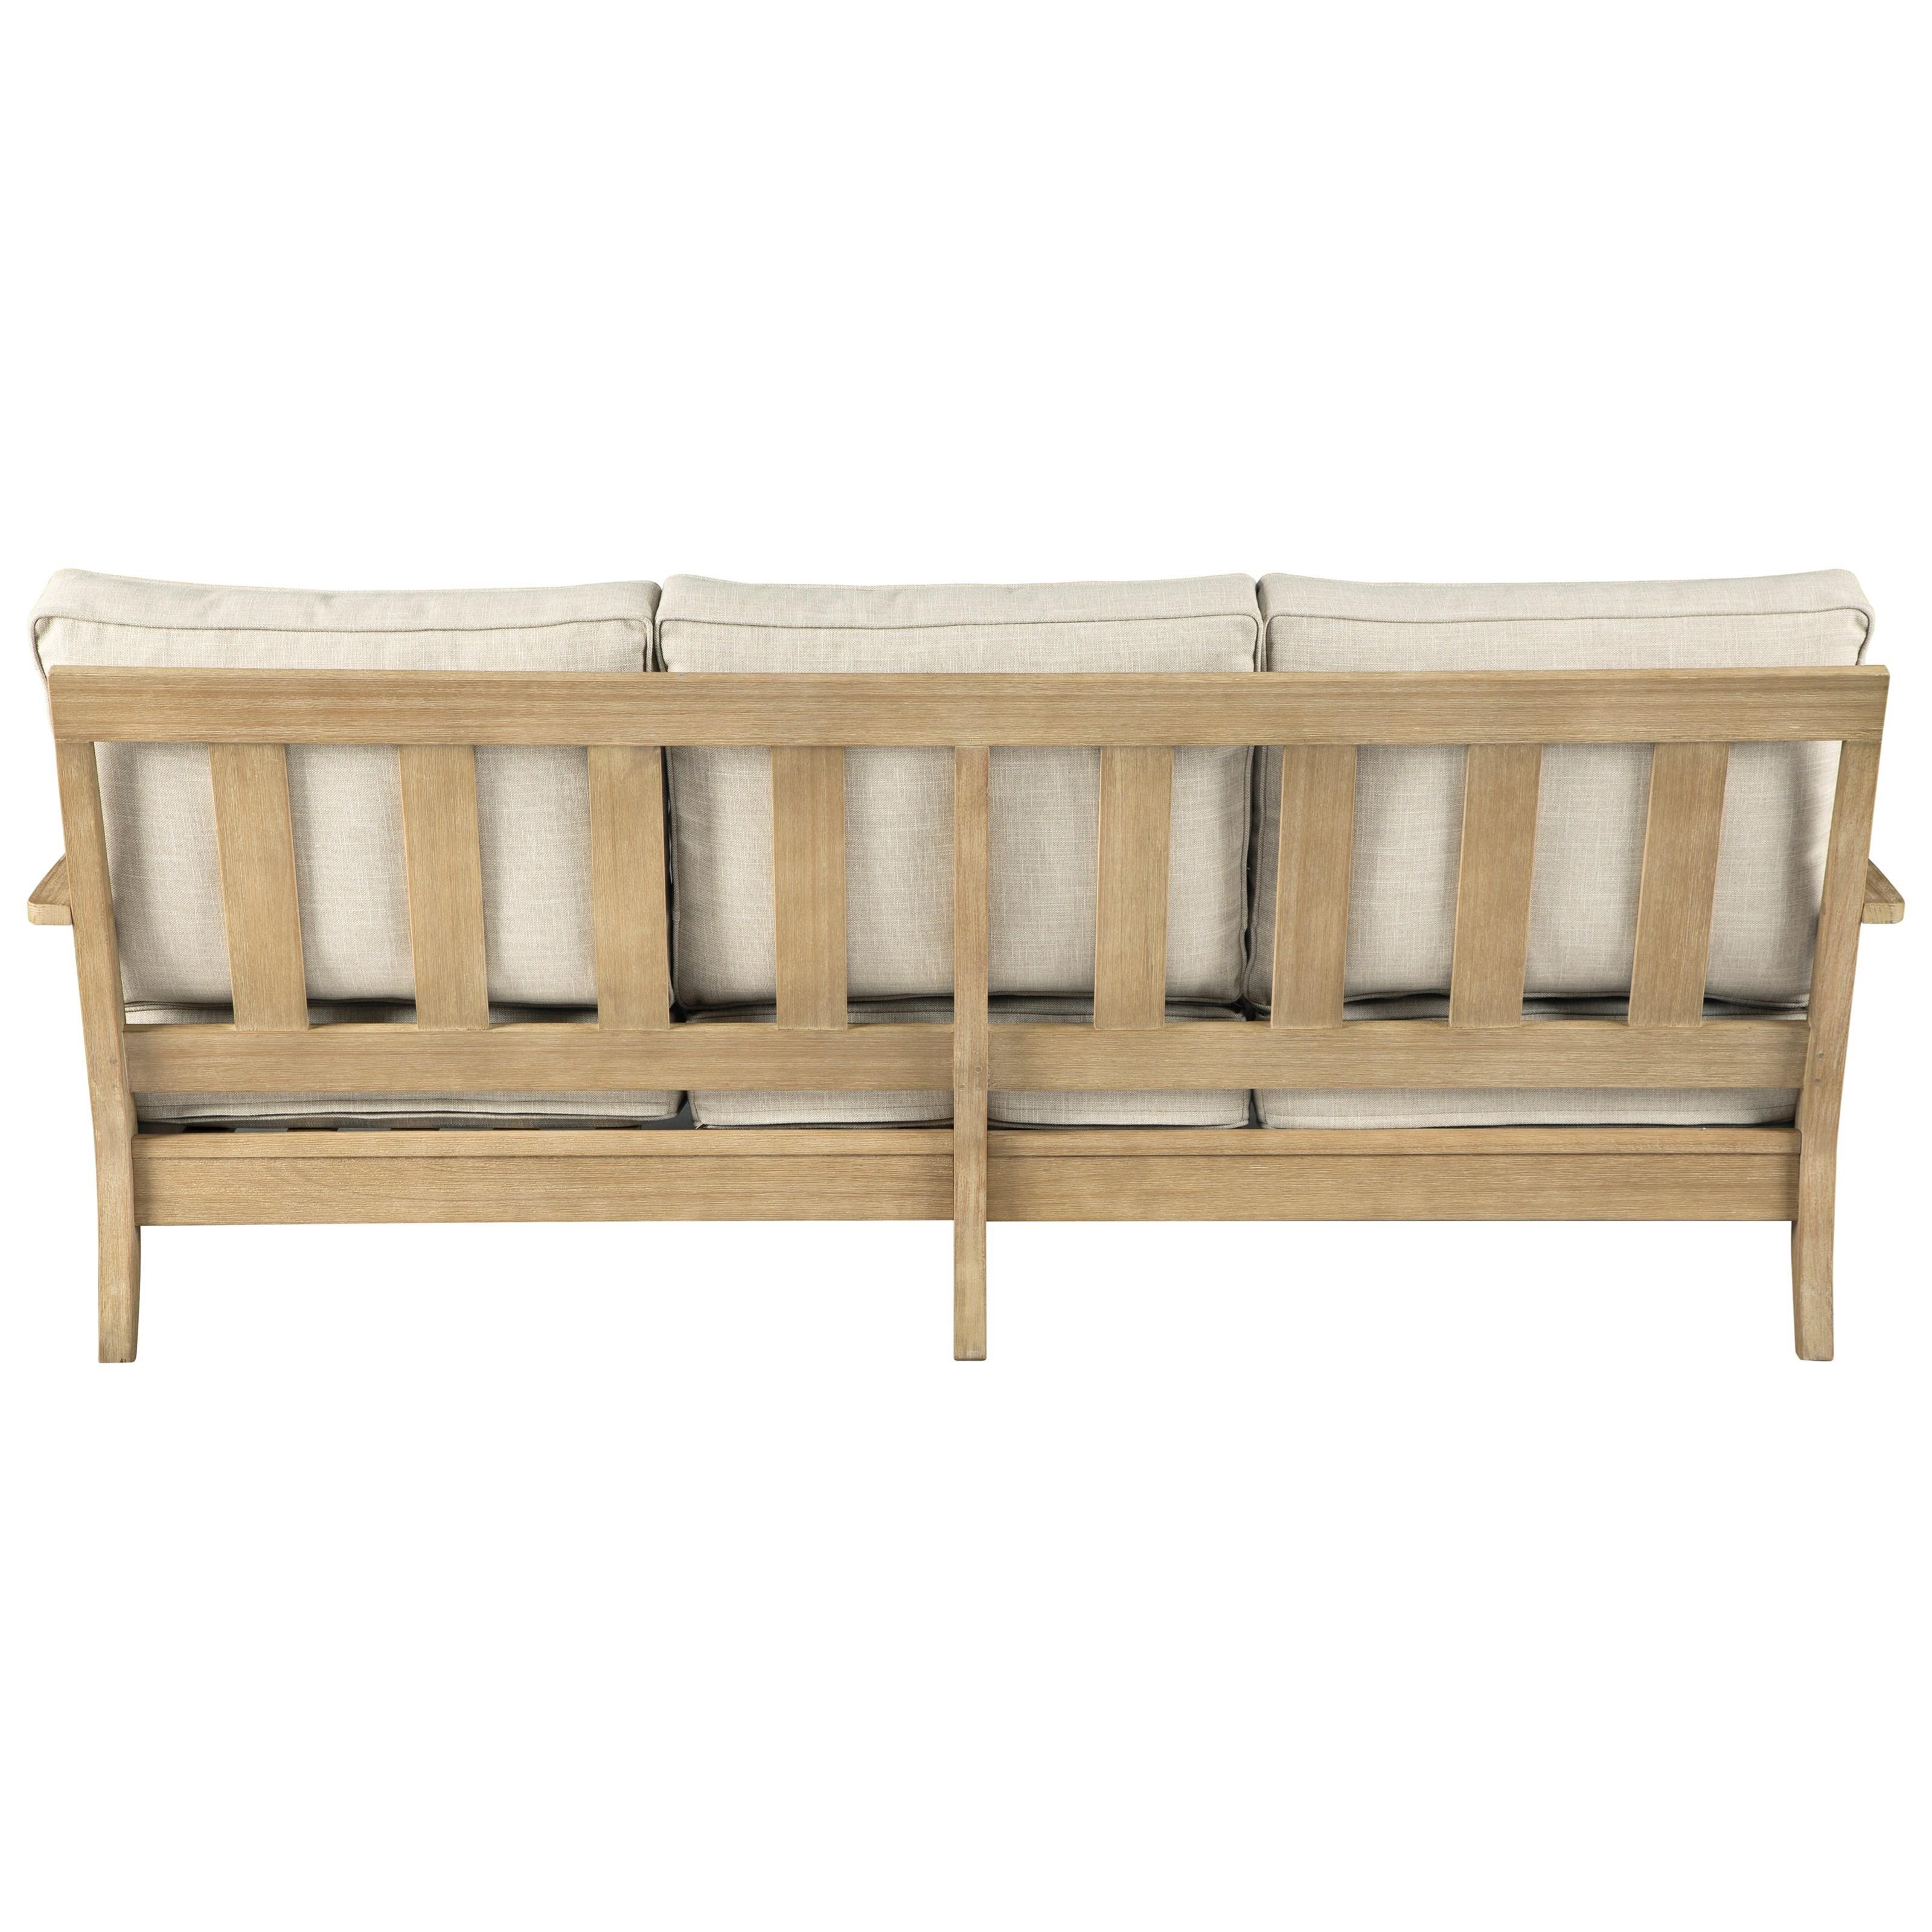 Levitz Furniture Store Locations: Signature Design By Ashley Clare View P801-838 Casual Sofa